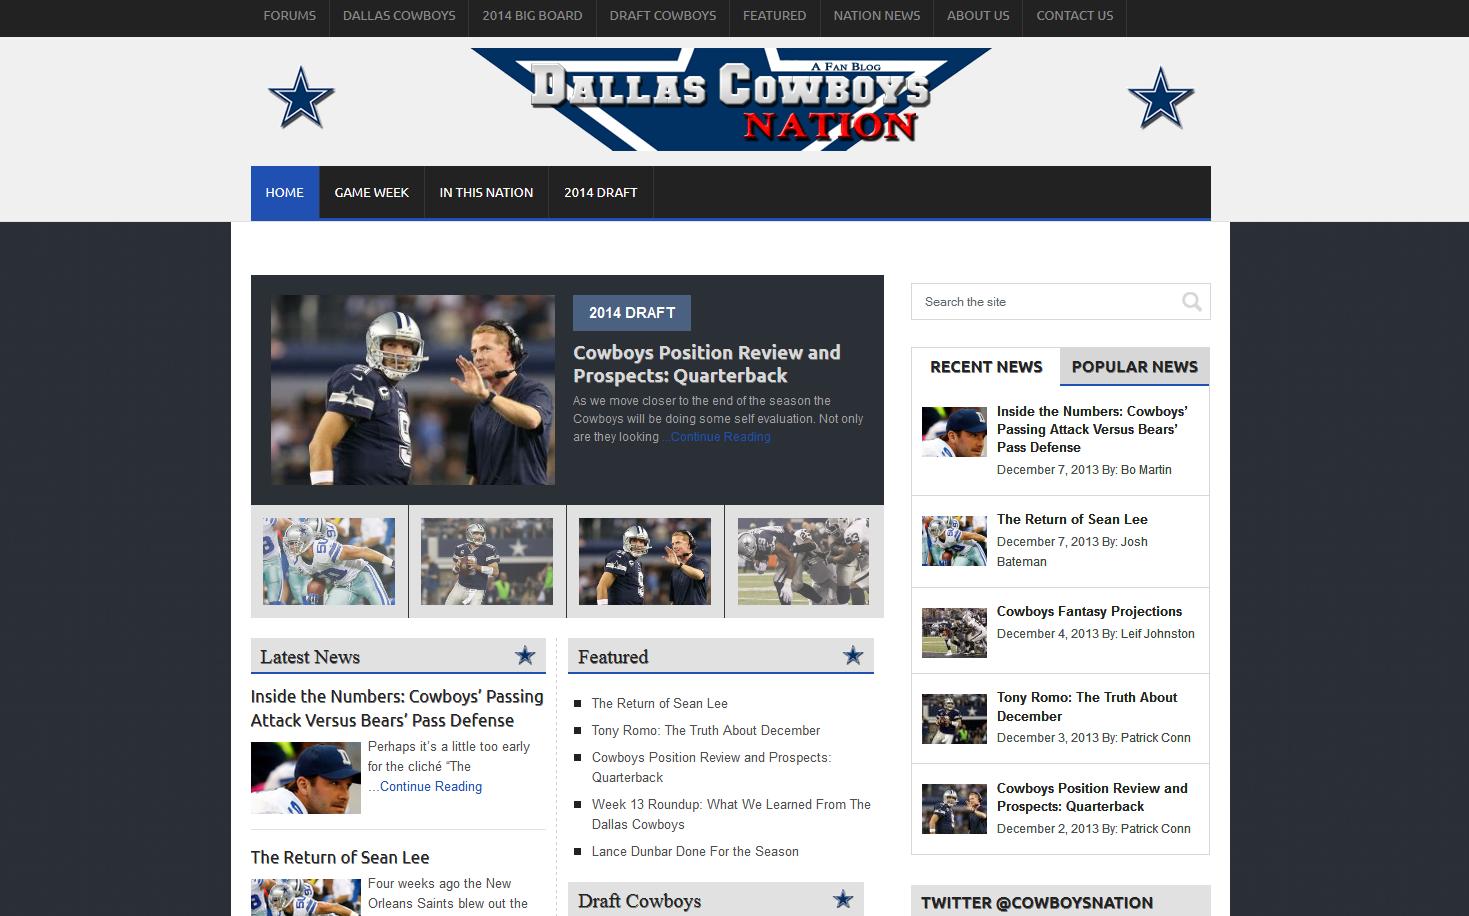 Inside The Star - DallasCowboysNation.com 4.0! 3